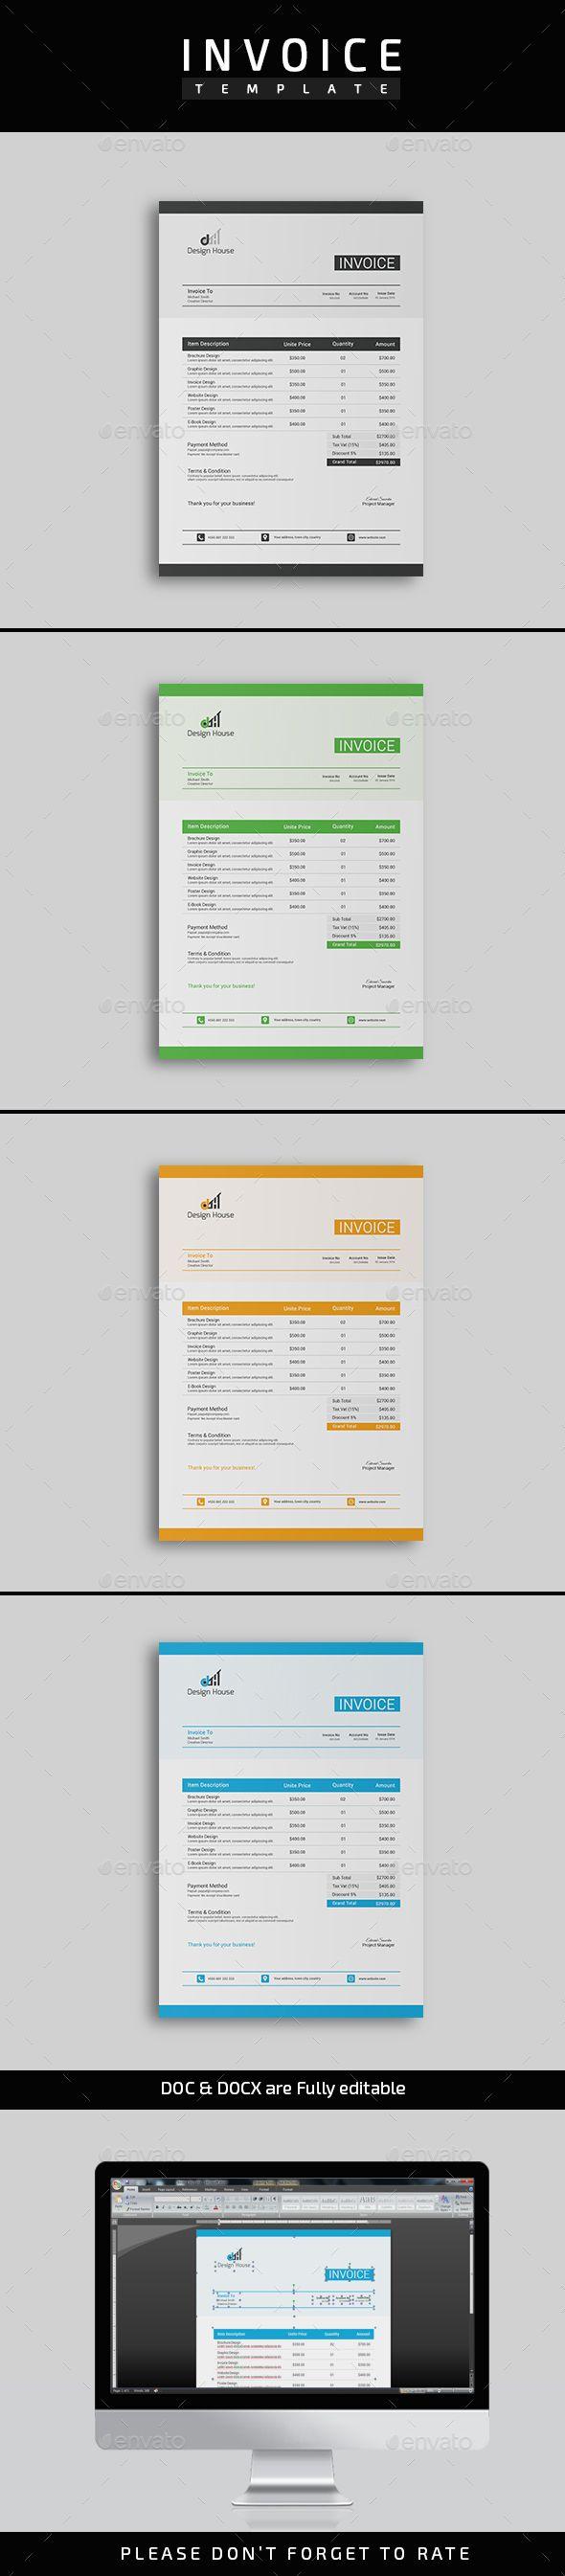 Invoice Template PSD DOCX DOC